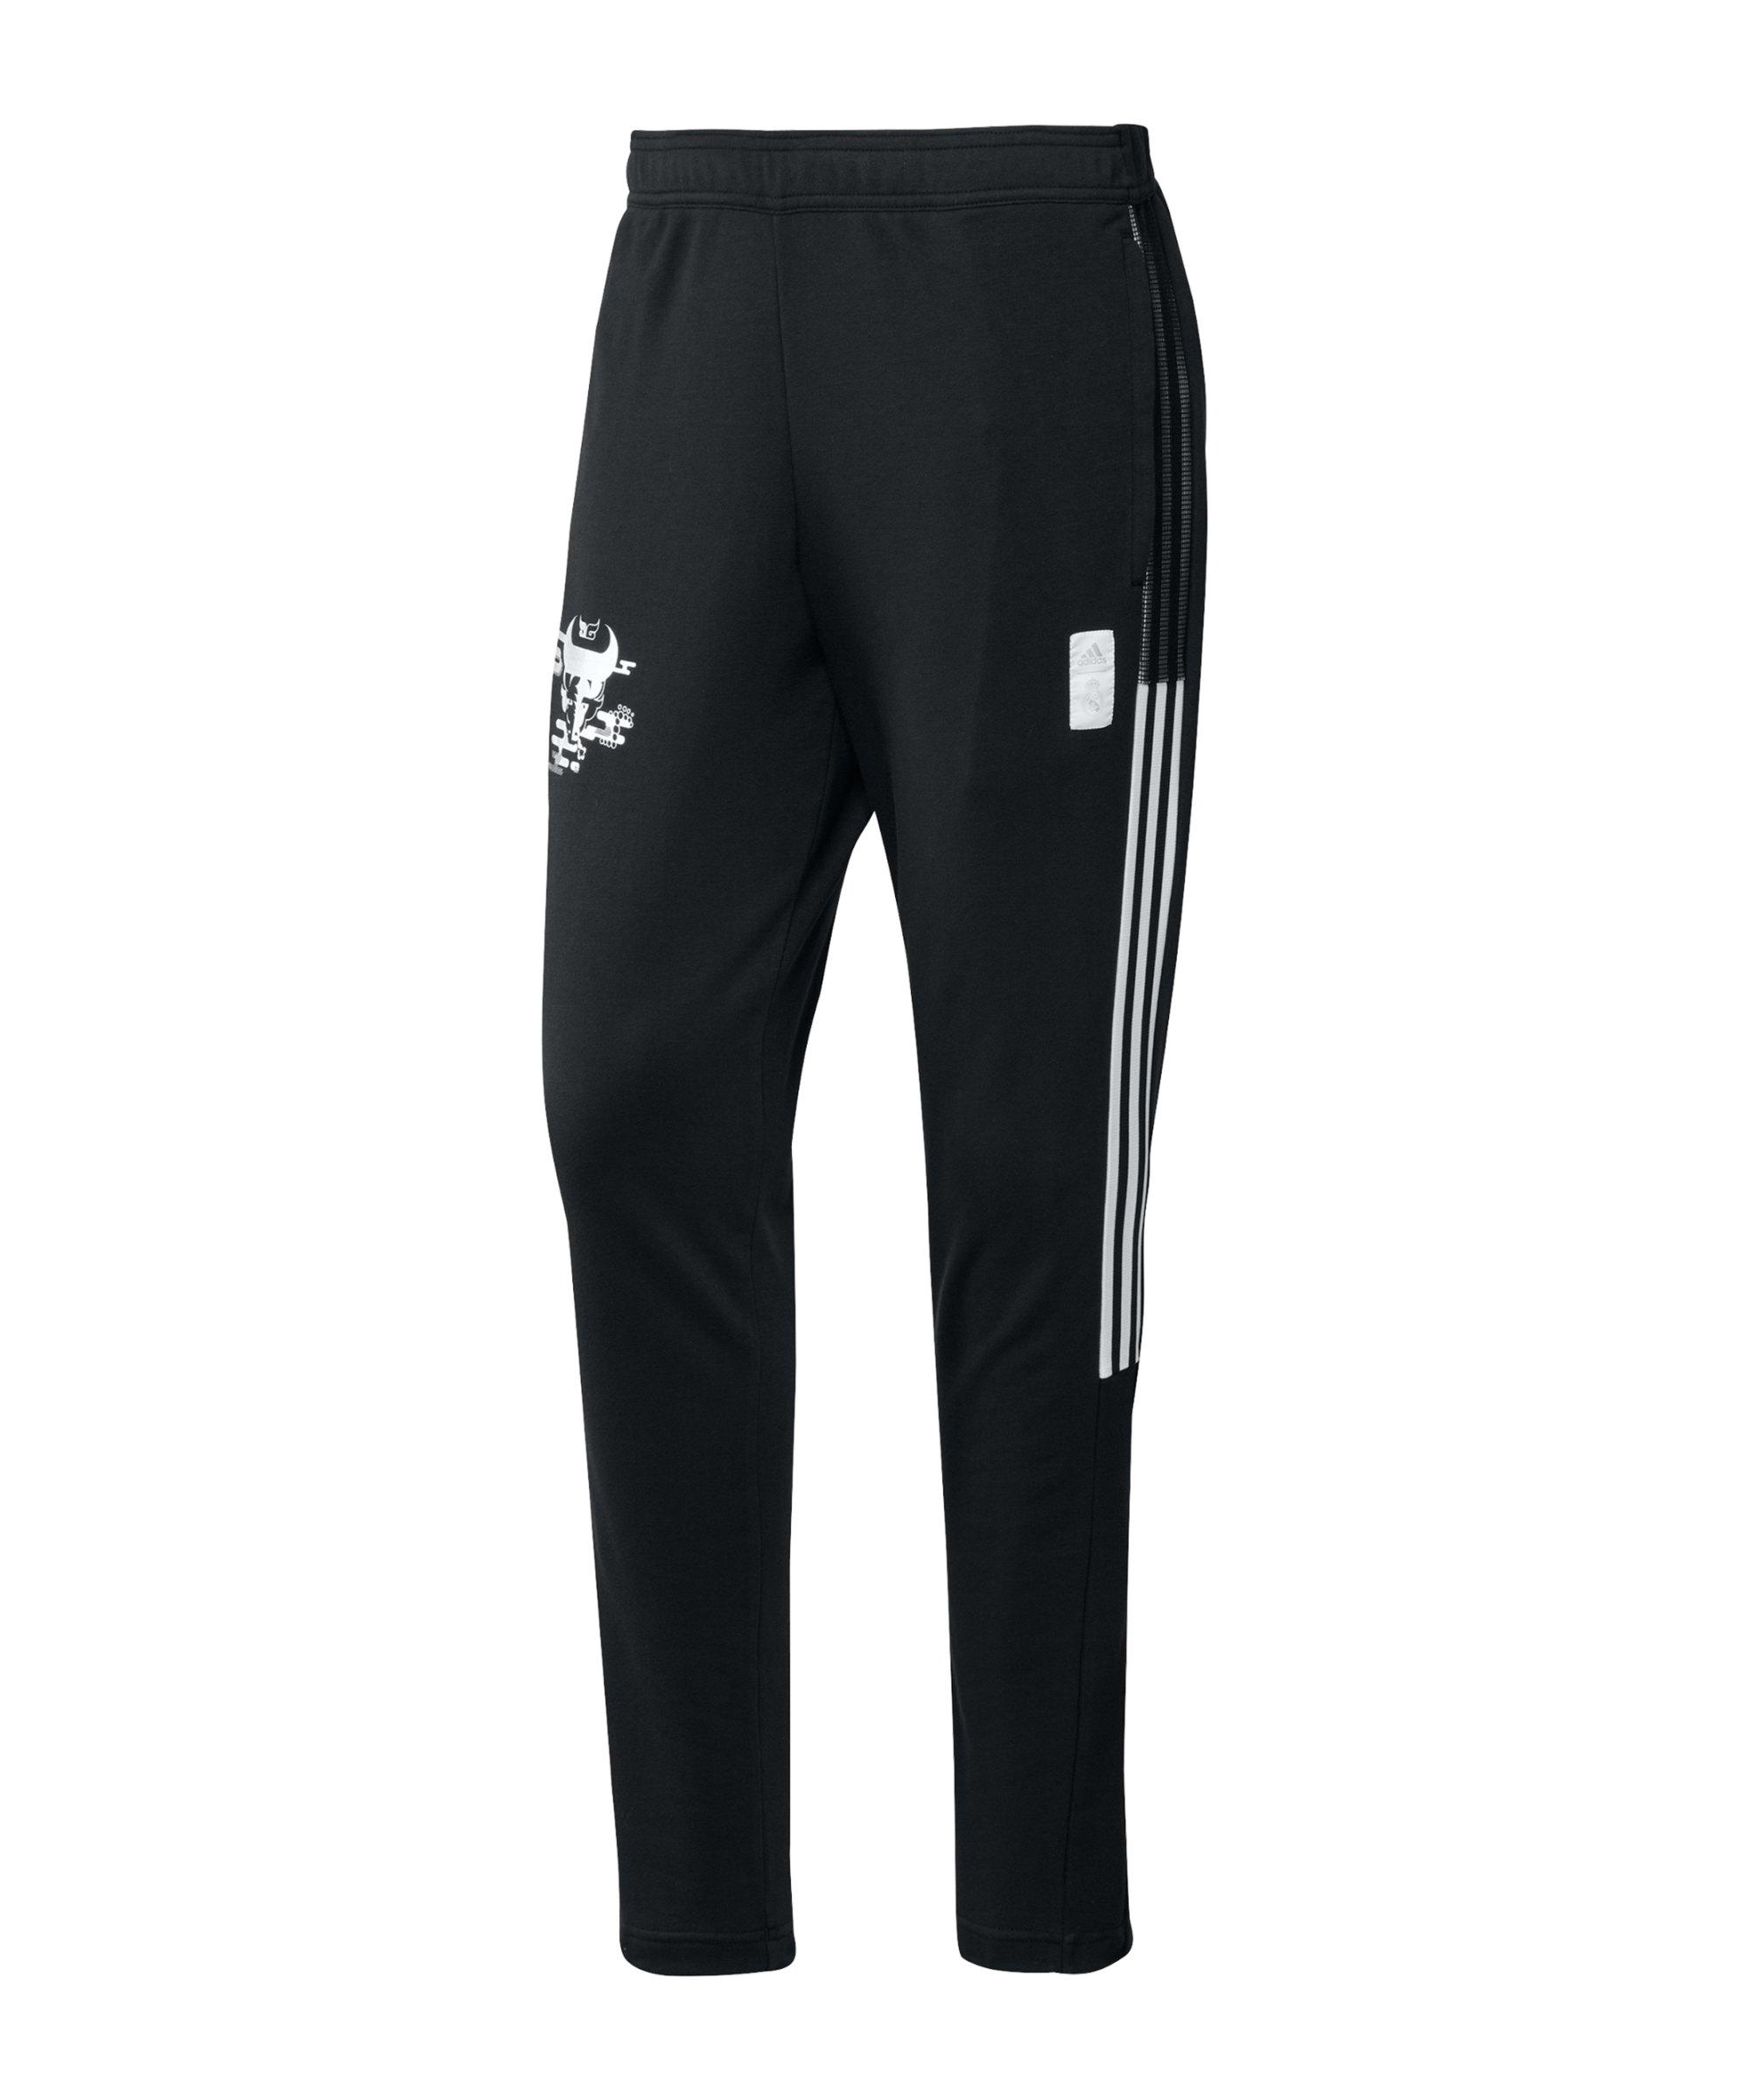 adidas Real Madrid CNY Jogginghose Schwarz - schwarz